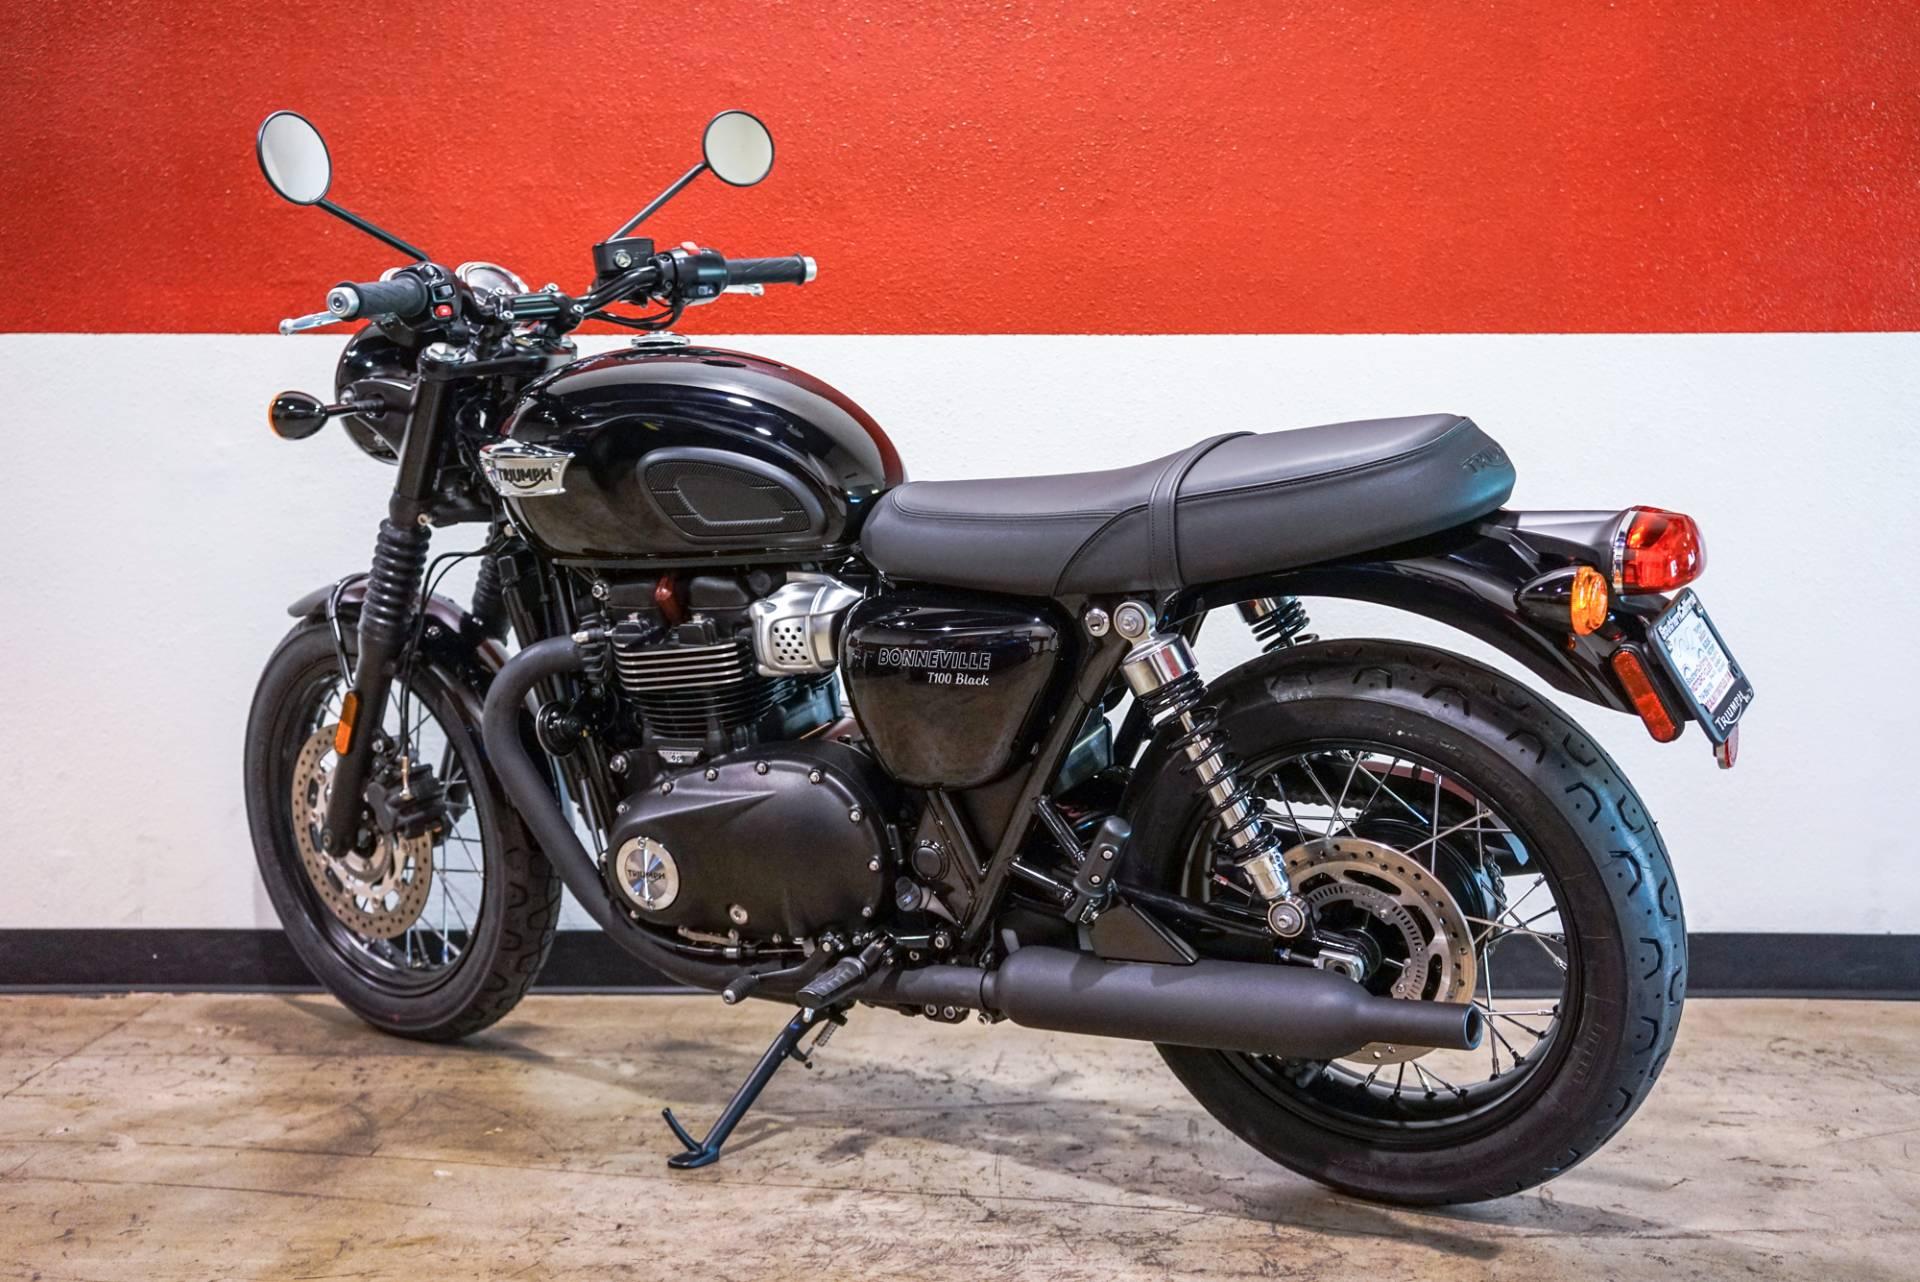 new 2017 triumph bonneville t100 motorcycles in brea, ca